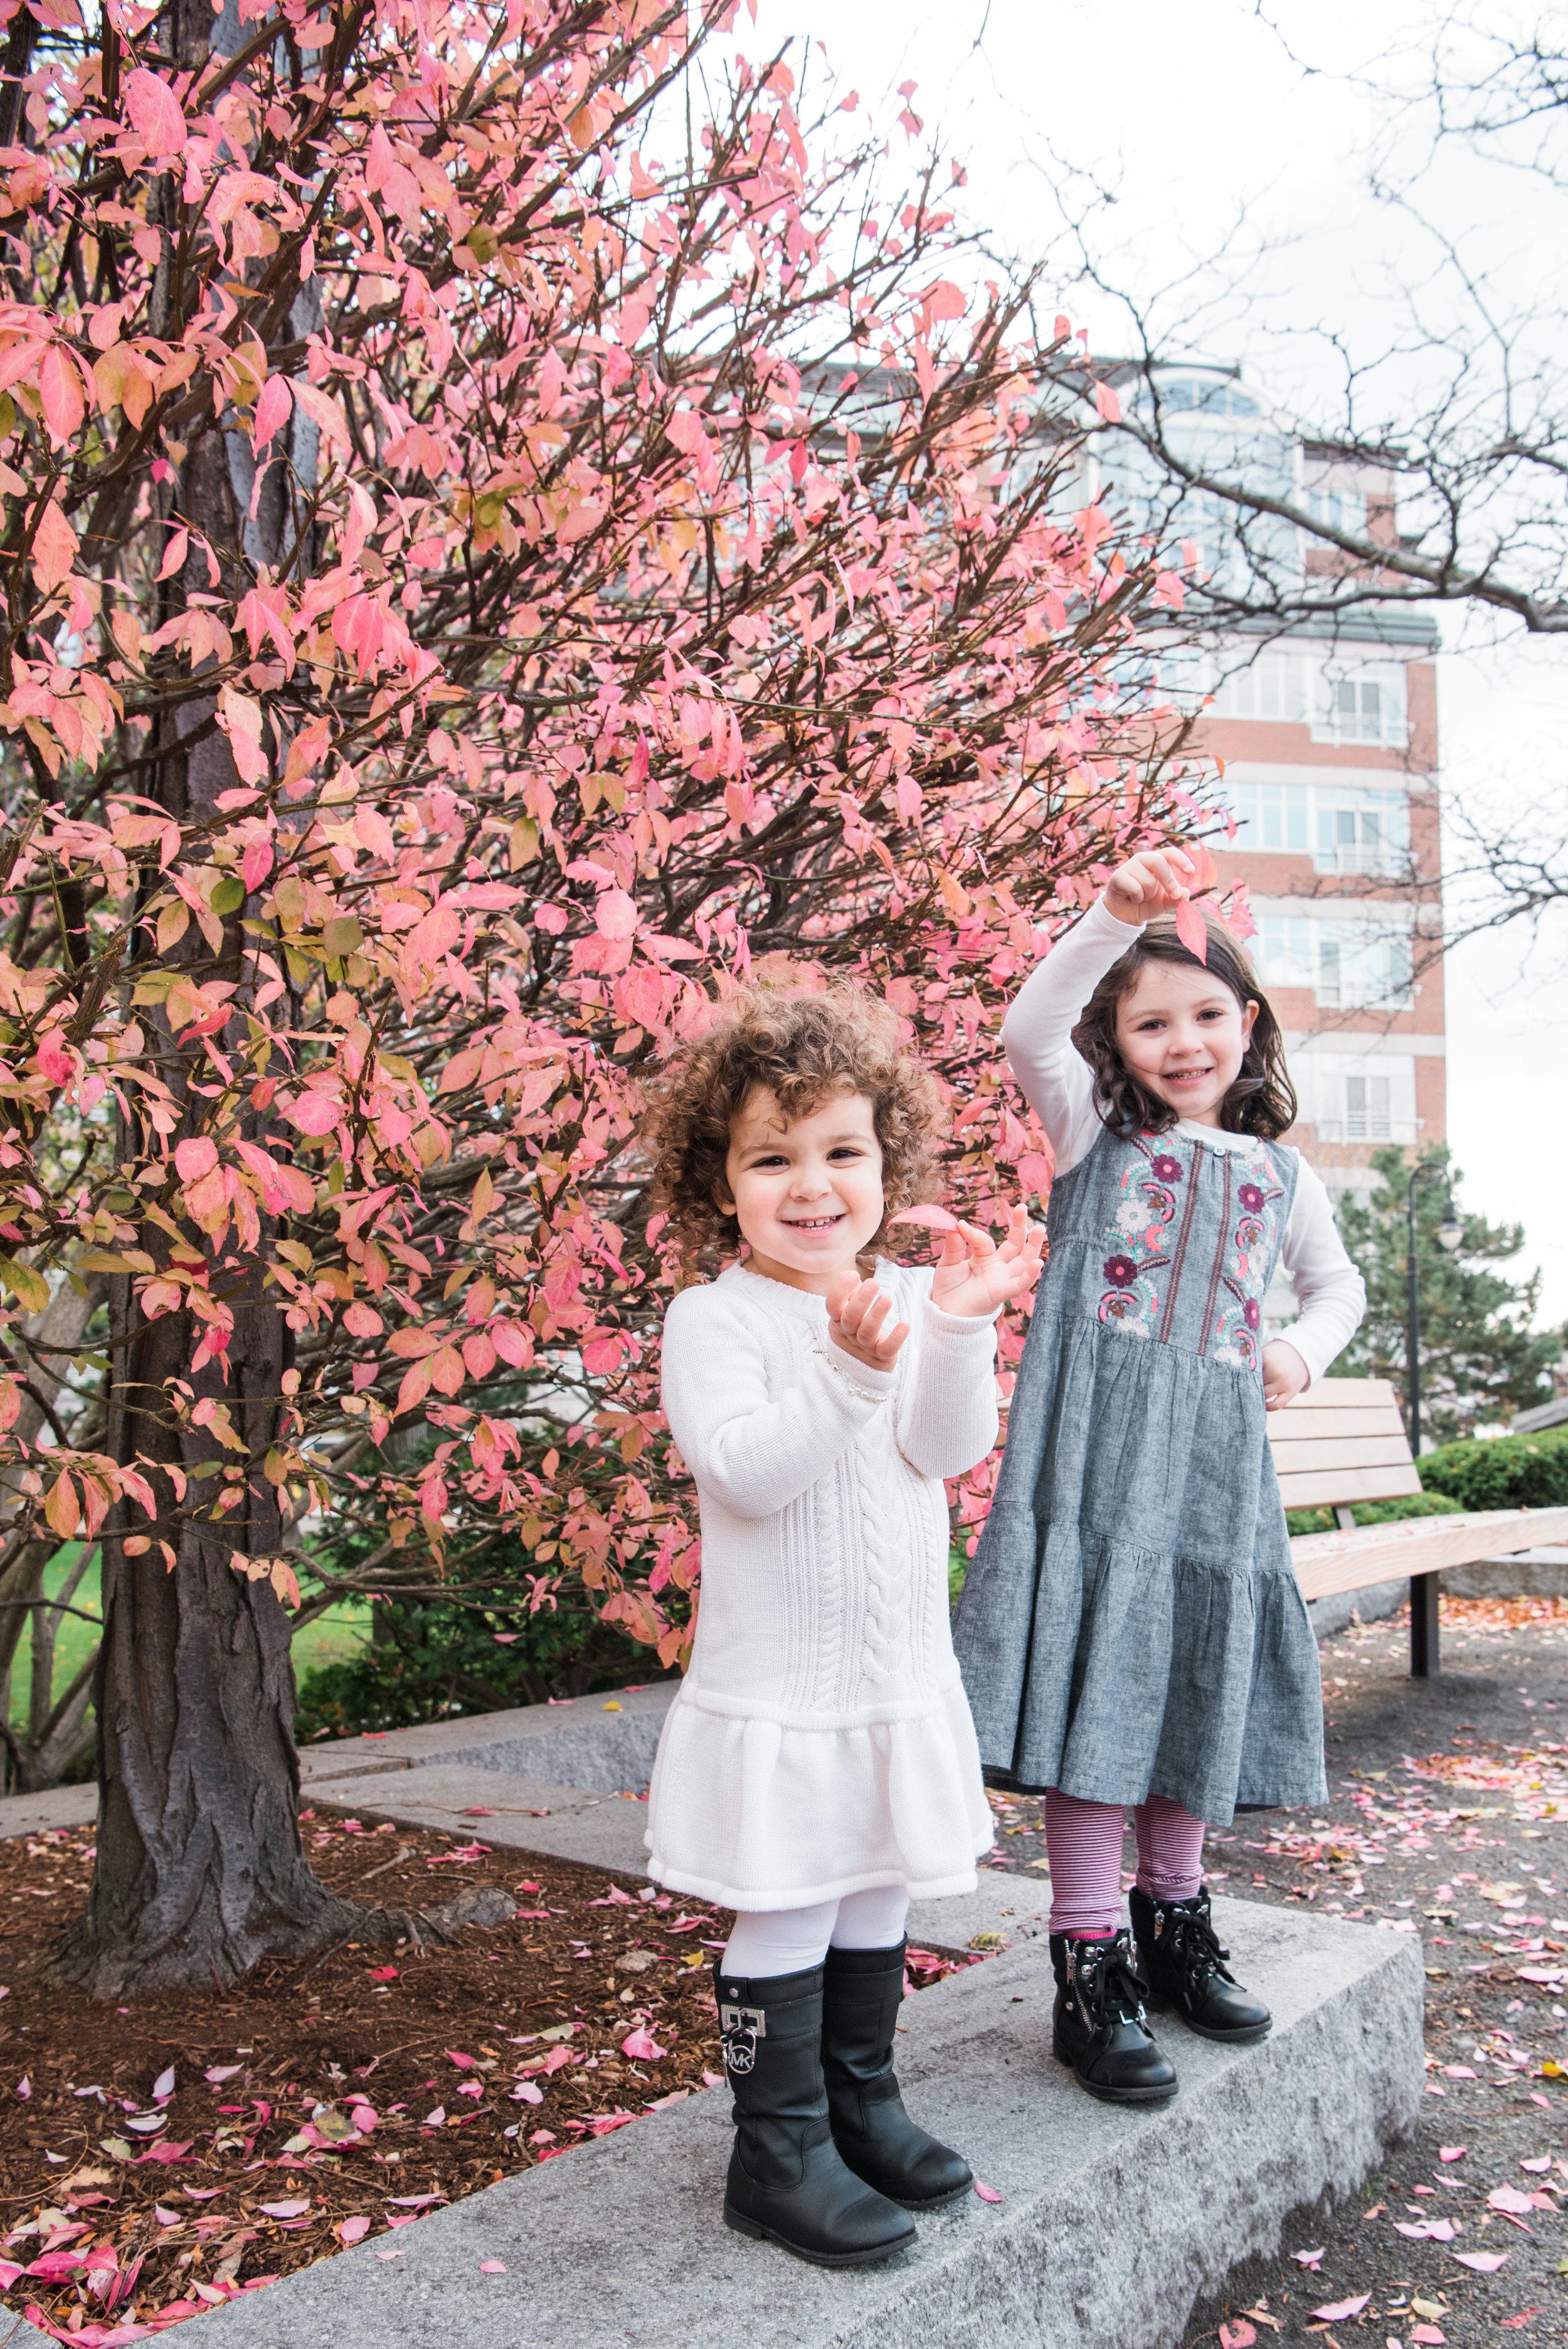 Gabriella and Valentina